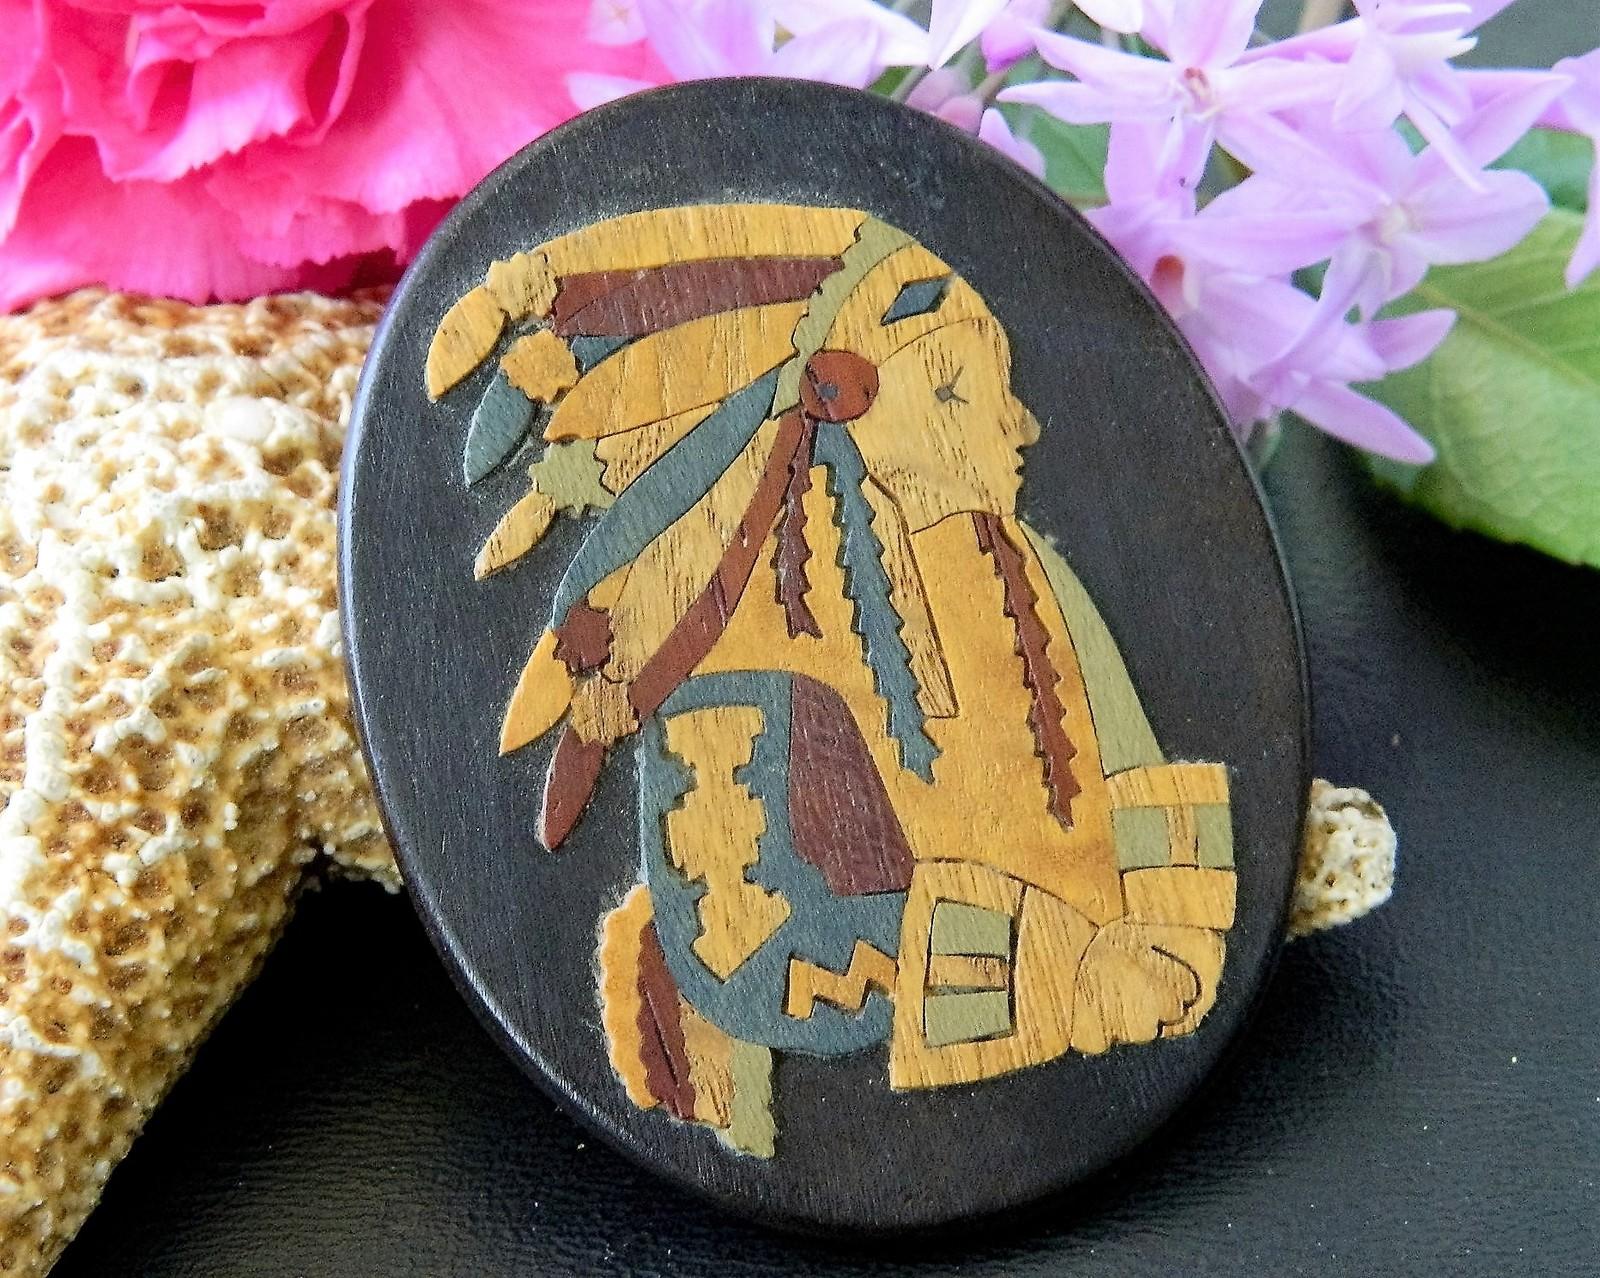 Vintage Marlow Woodcuts Brooch Pin Wood Native American Indian Chief